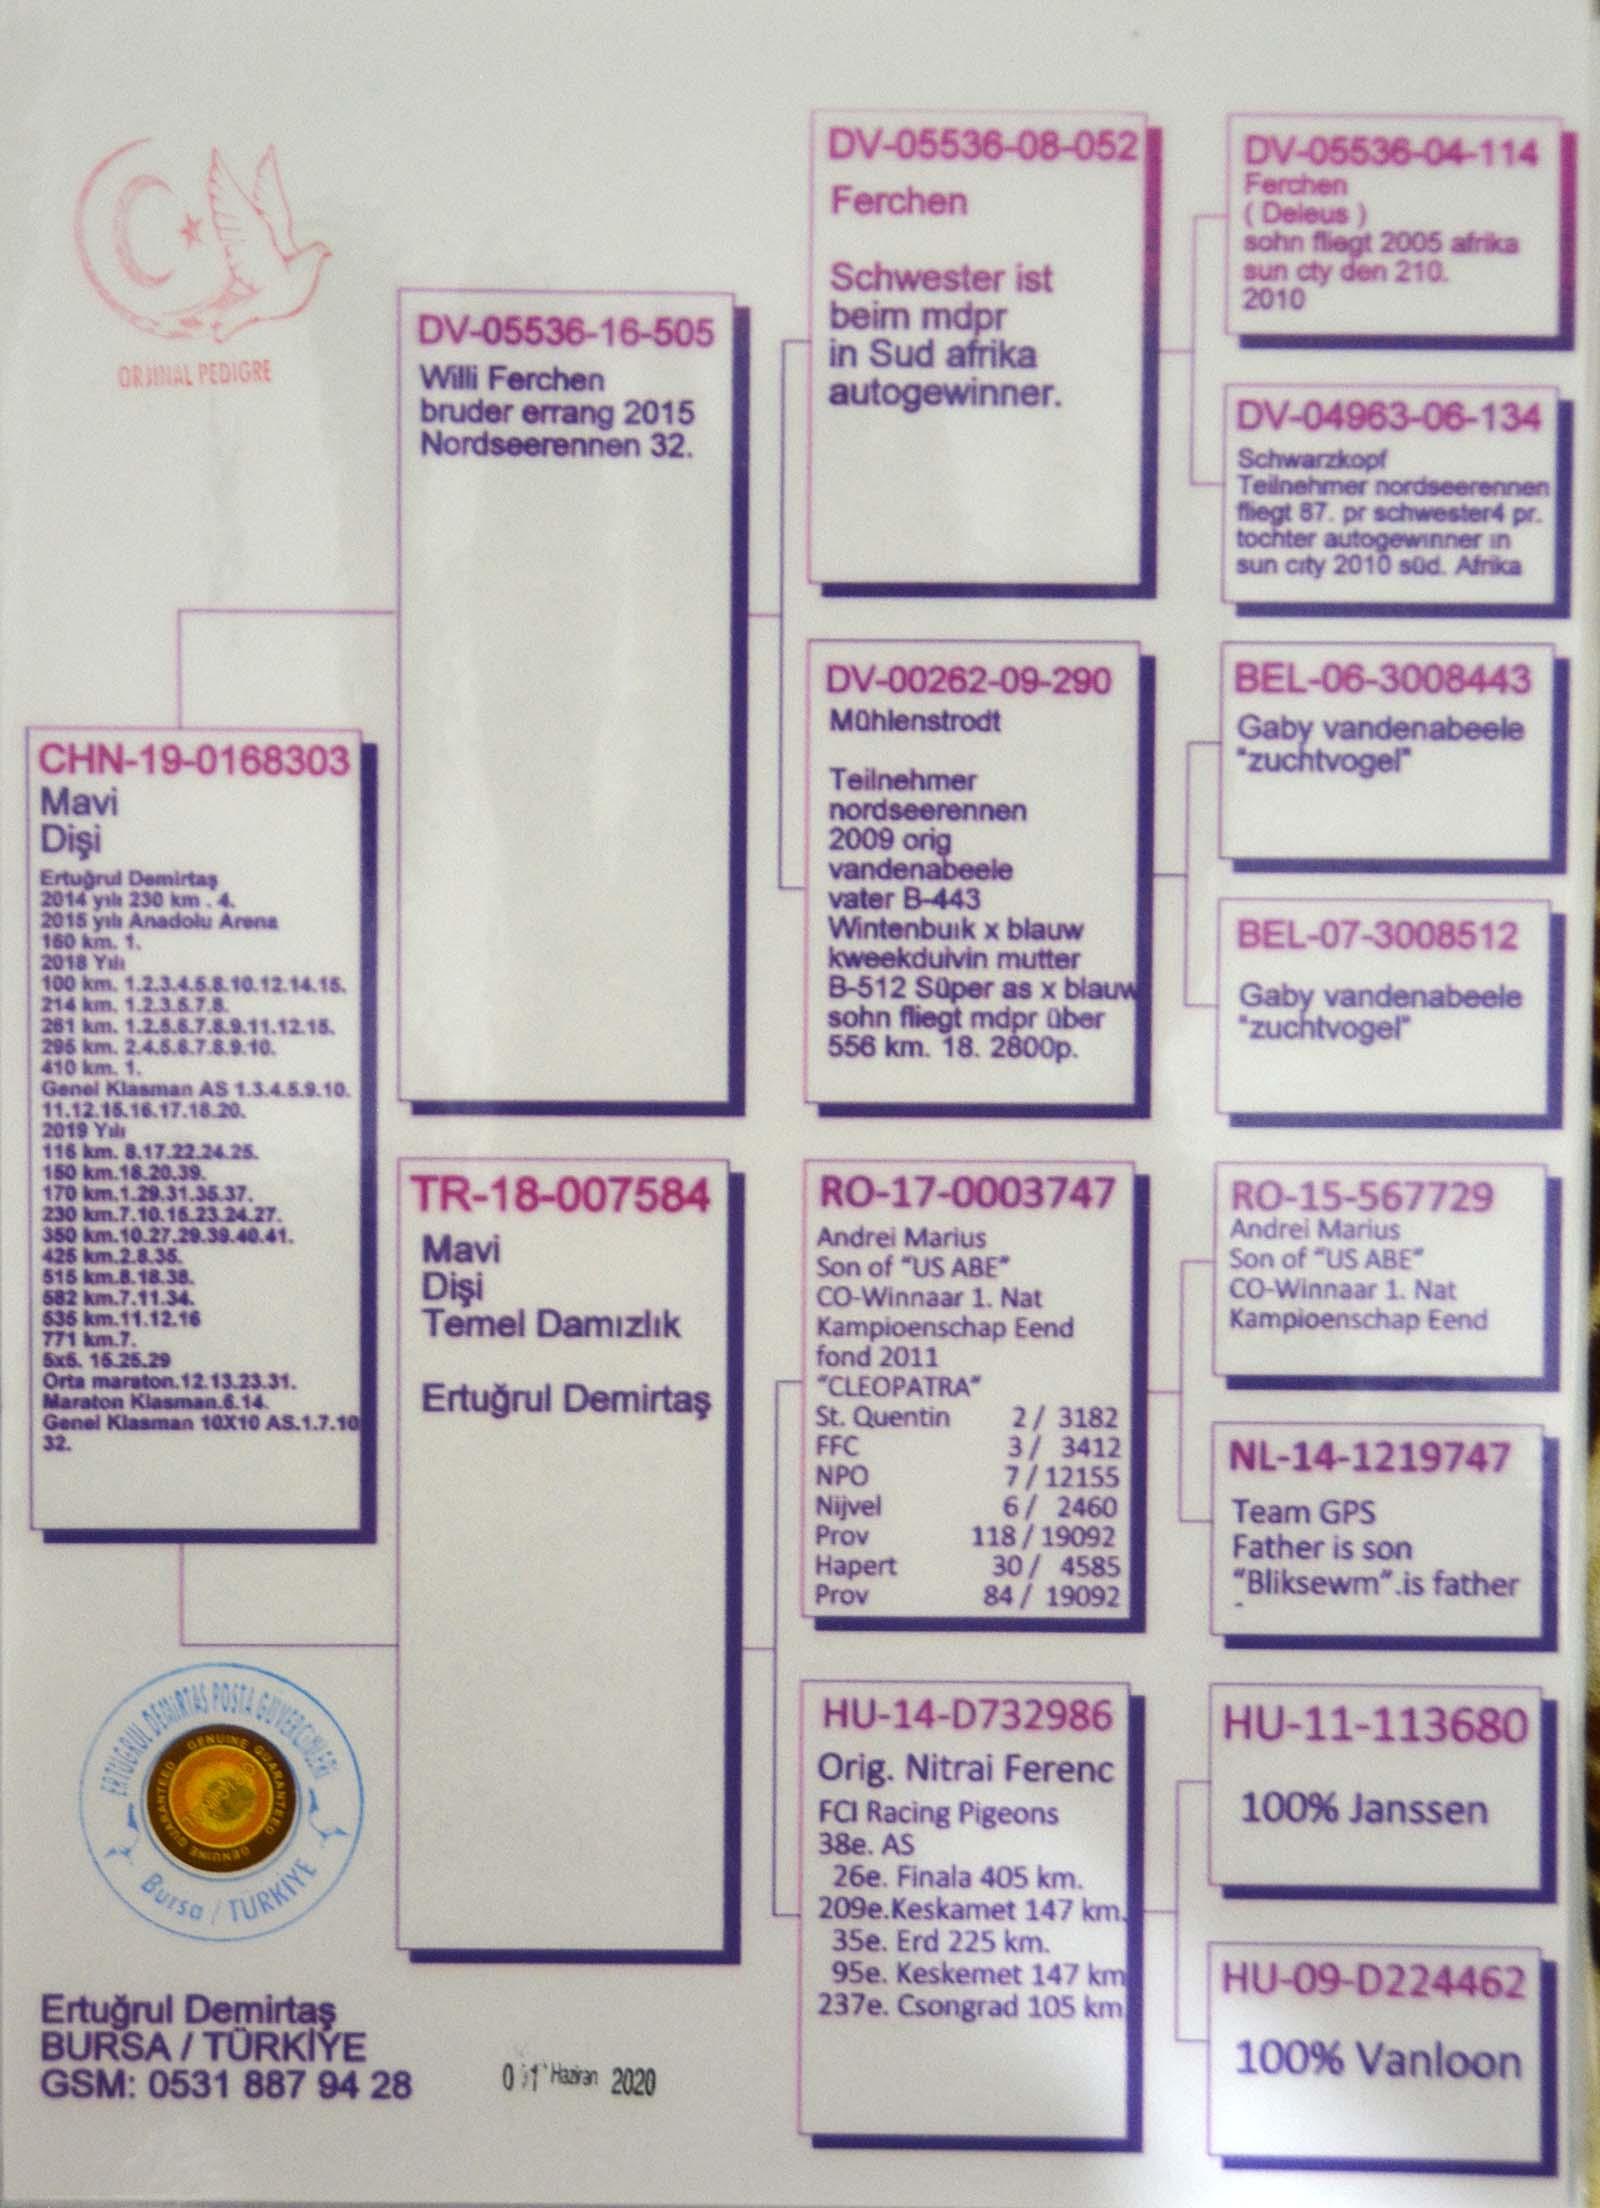 CHN19-0168303 DİŞİ / G. VANDENABEELE - DELEUS - A.DIJKSTRA - JANSSEN - V. LOON